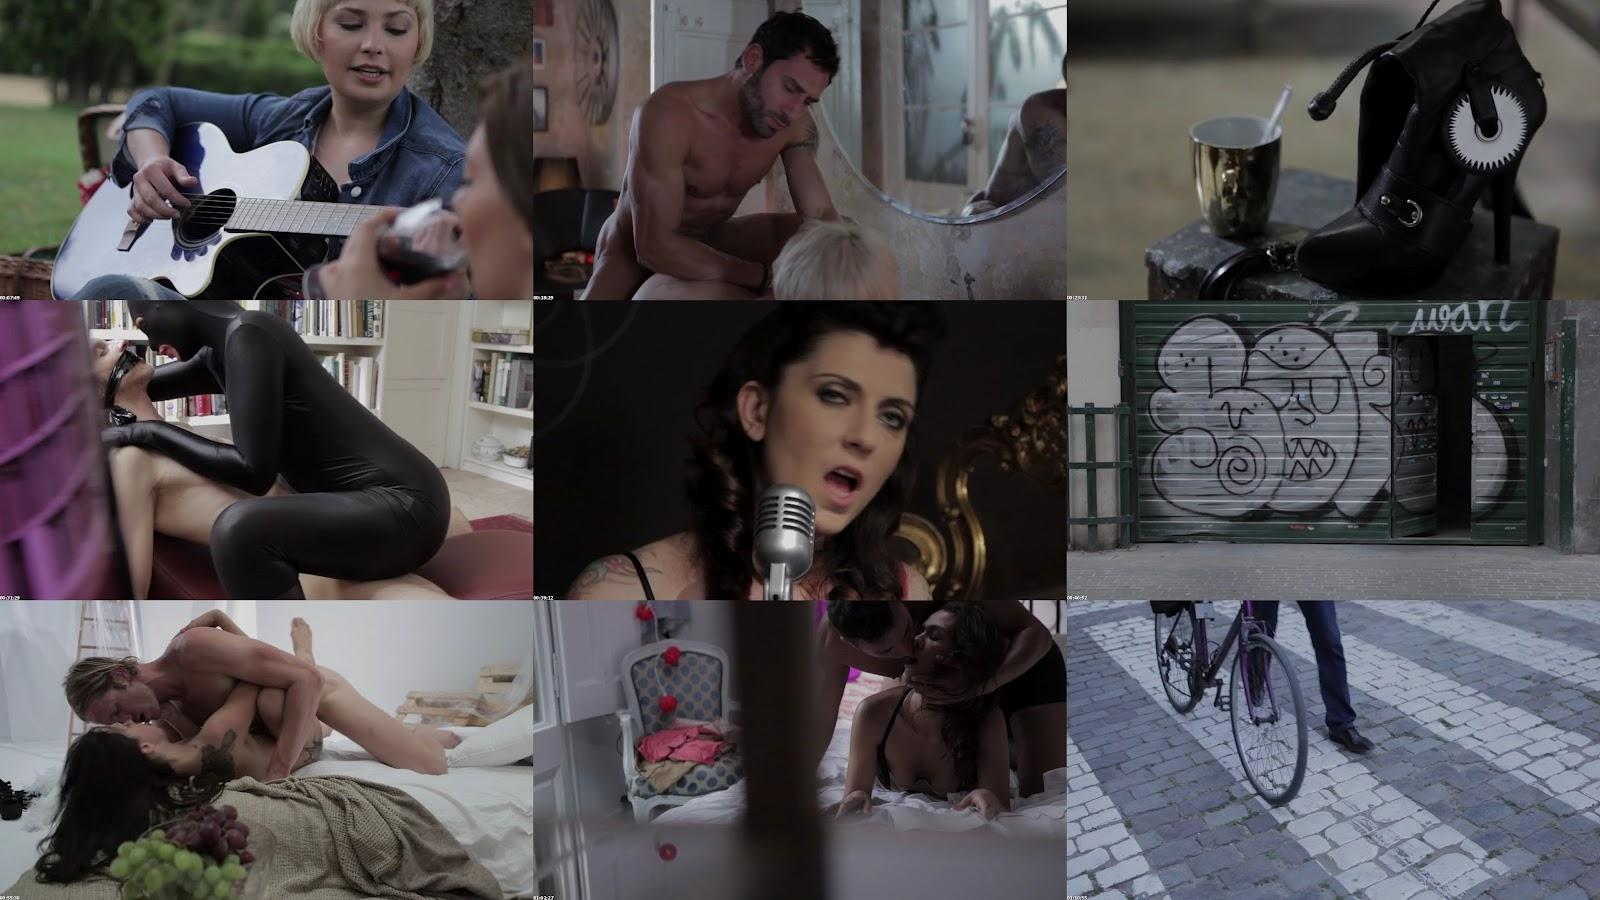 http://1.bp.blogspot.com/-ZrF1xCS4N8w/UBtmVuBSrOI/AAAAAAAAHh0/u3RiFmjoWY8/s1600/Cabaret+Desire+(2011)+BluRay+720p+Screen.jpg